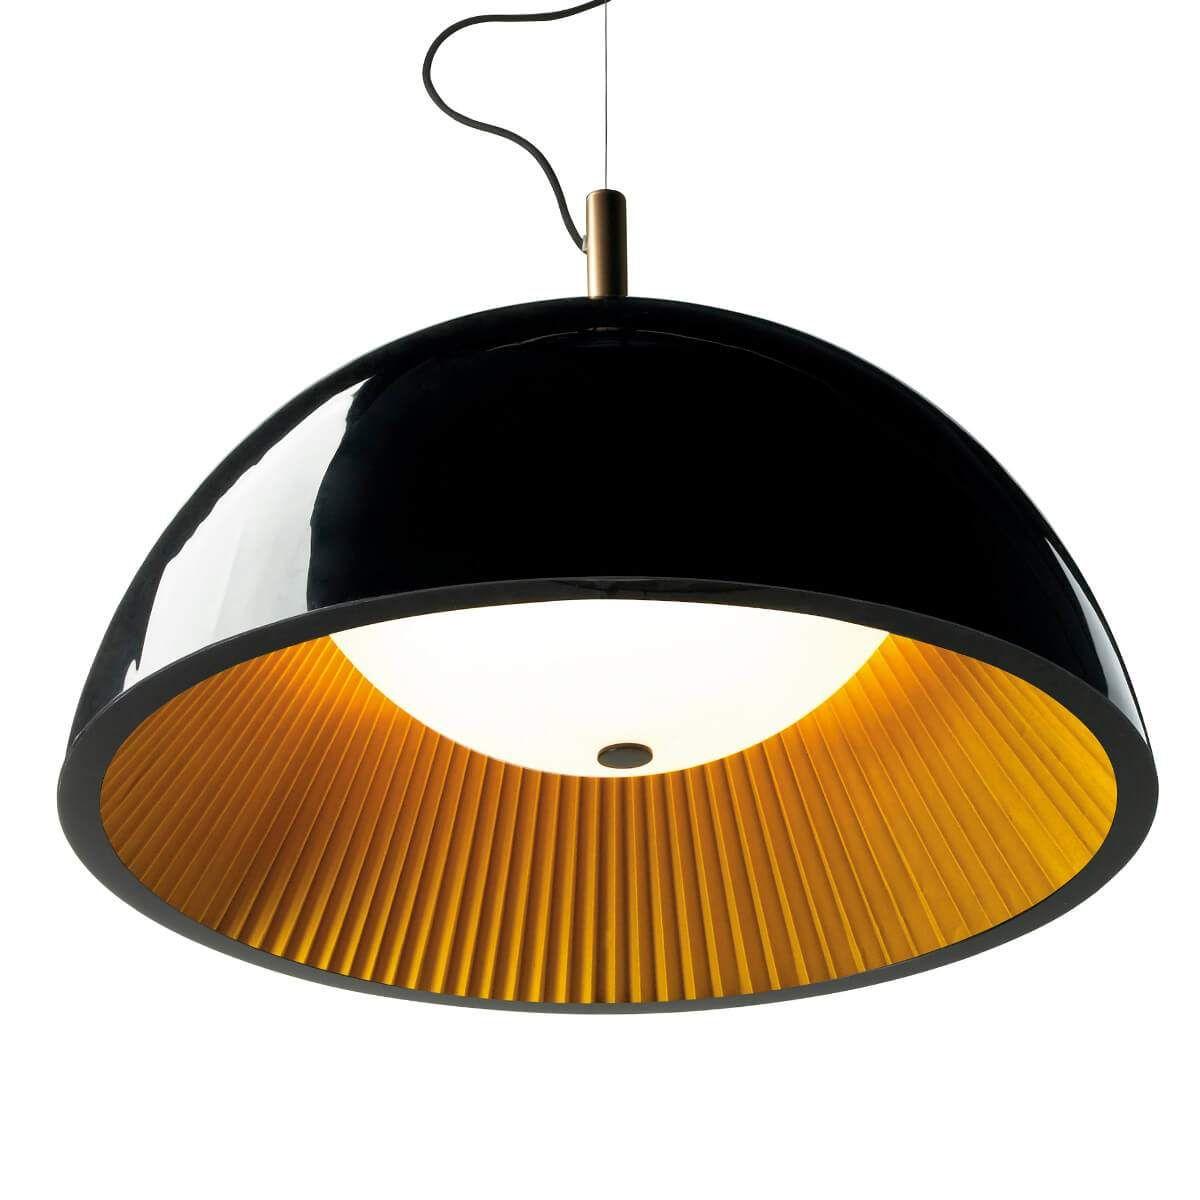 Lampe De Table Neoz Lampe De Chevet Rose Lampe De Table Ribbon Habitat Lampes ŕ Poser Alinea Lampe De Sal Luminaire Led Lampe Salon Luminaire